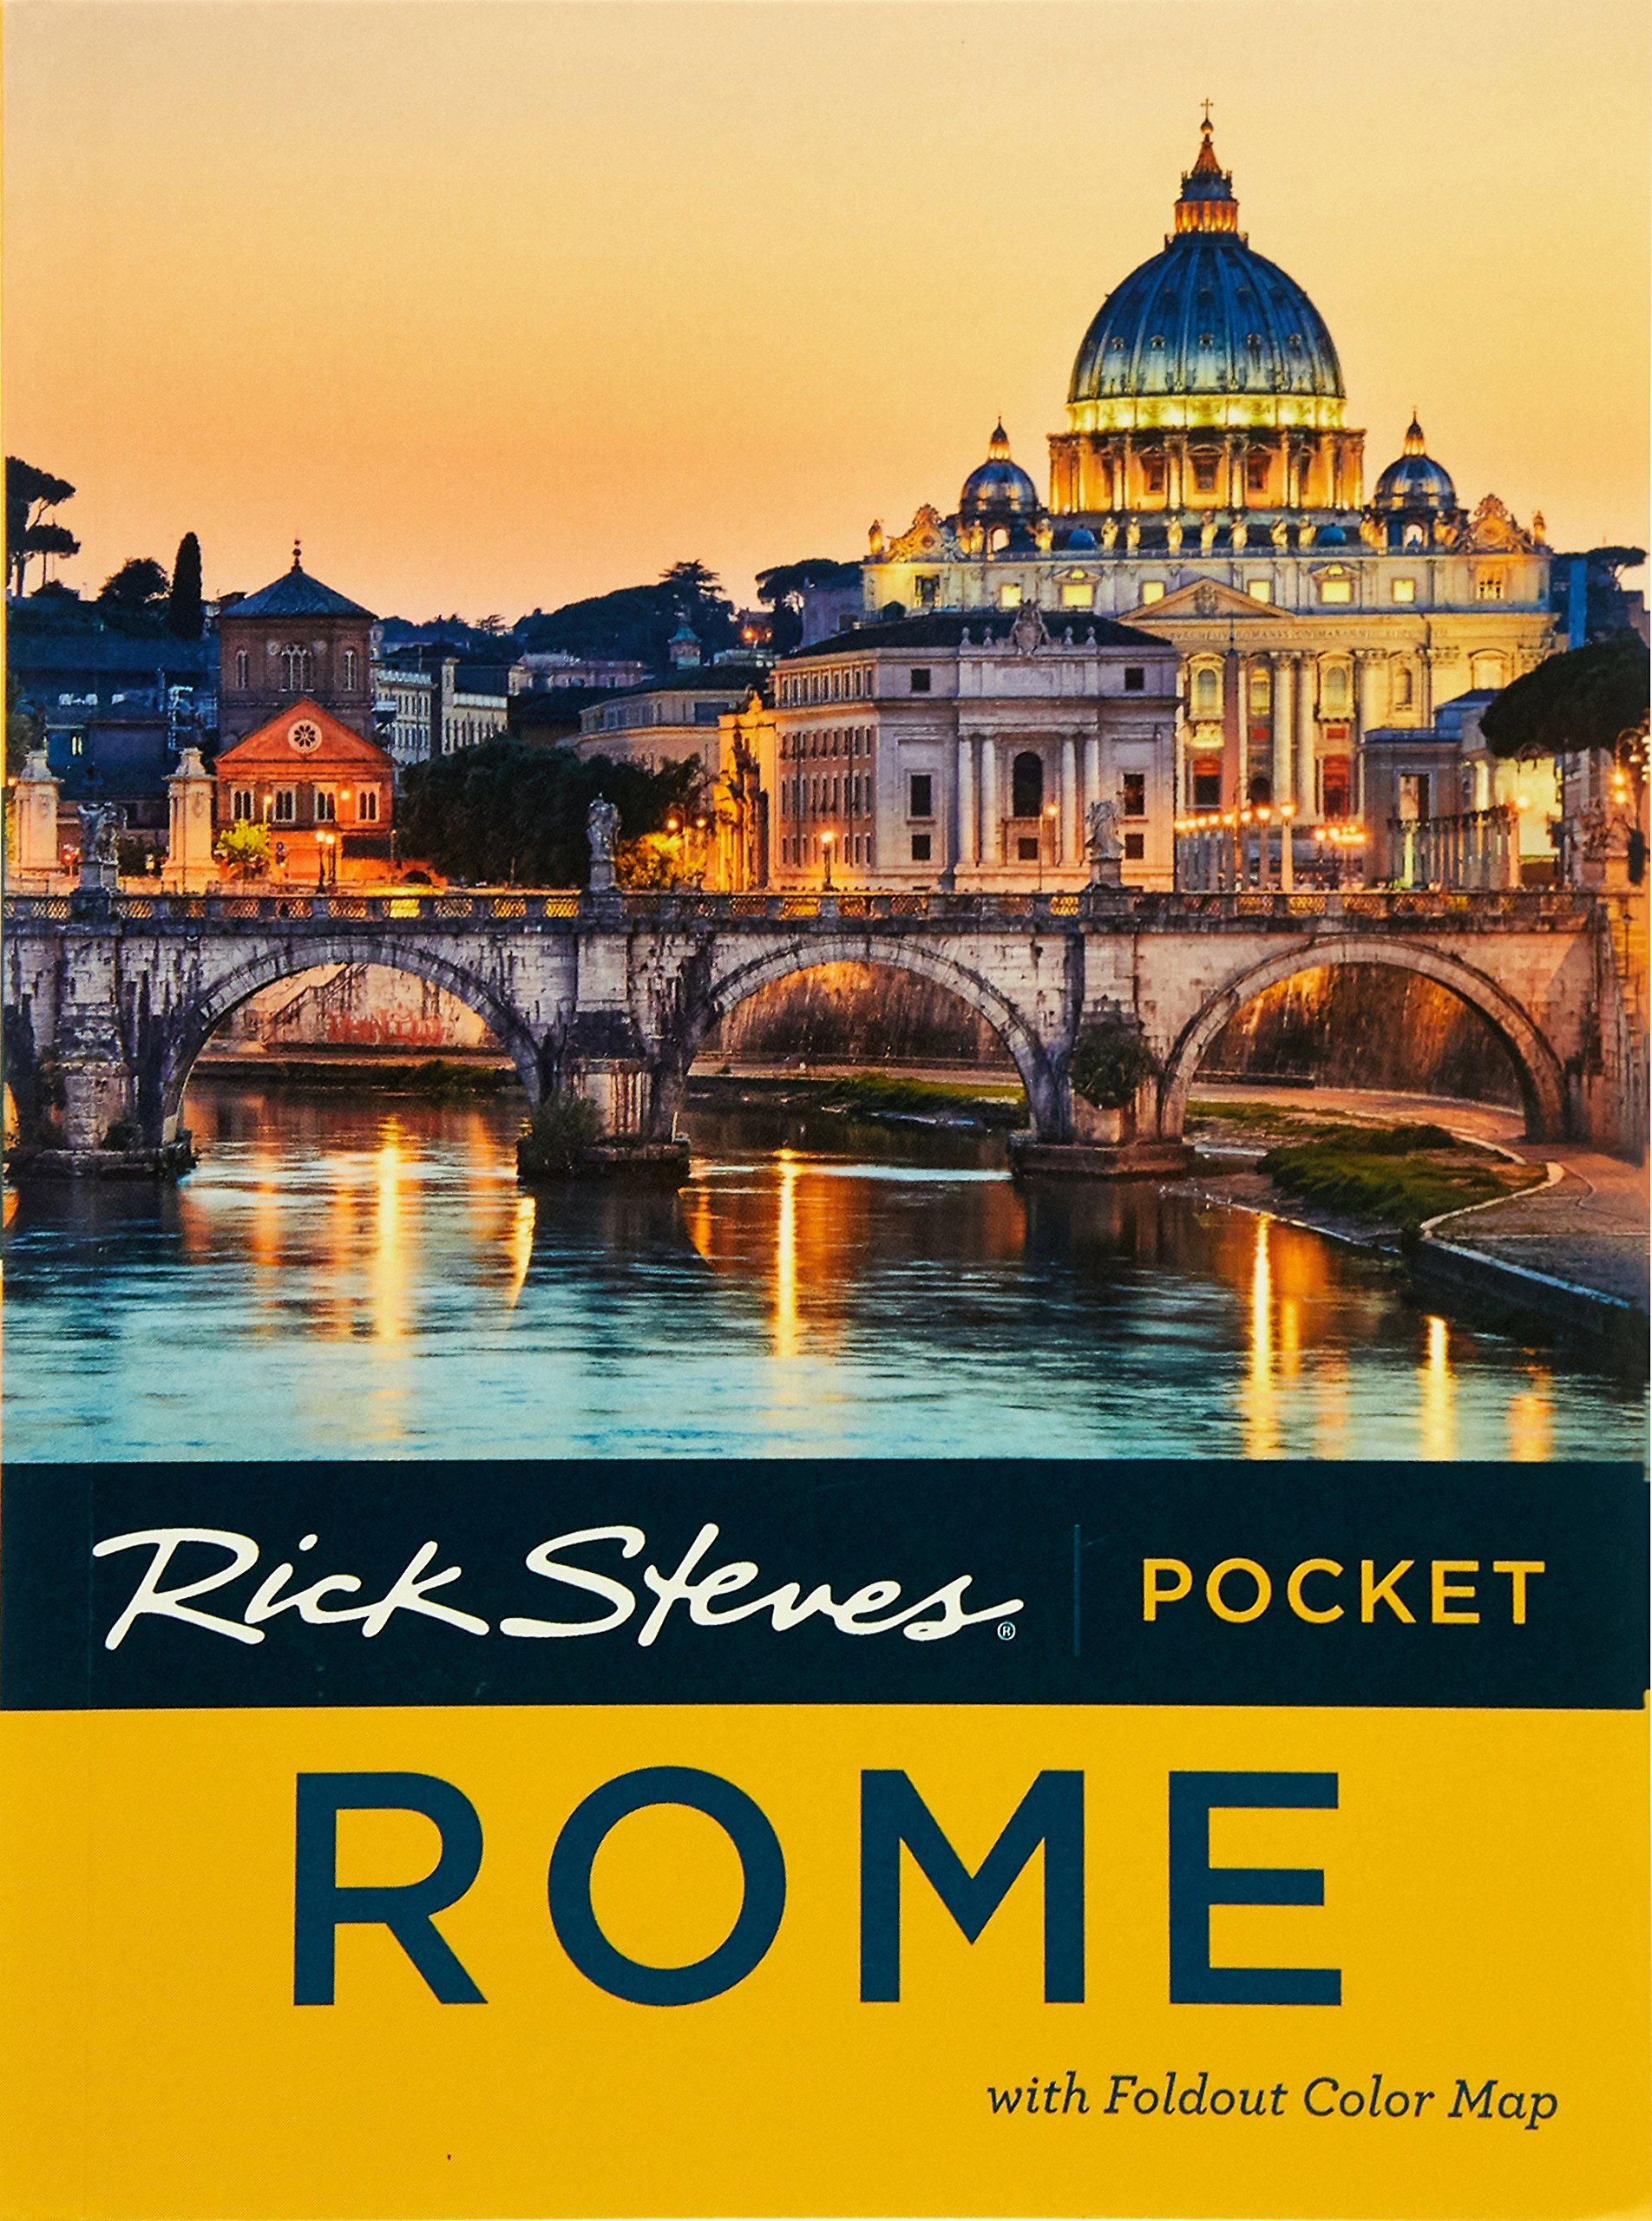 Rick Steves Pocket Rome product image